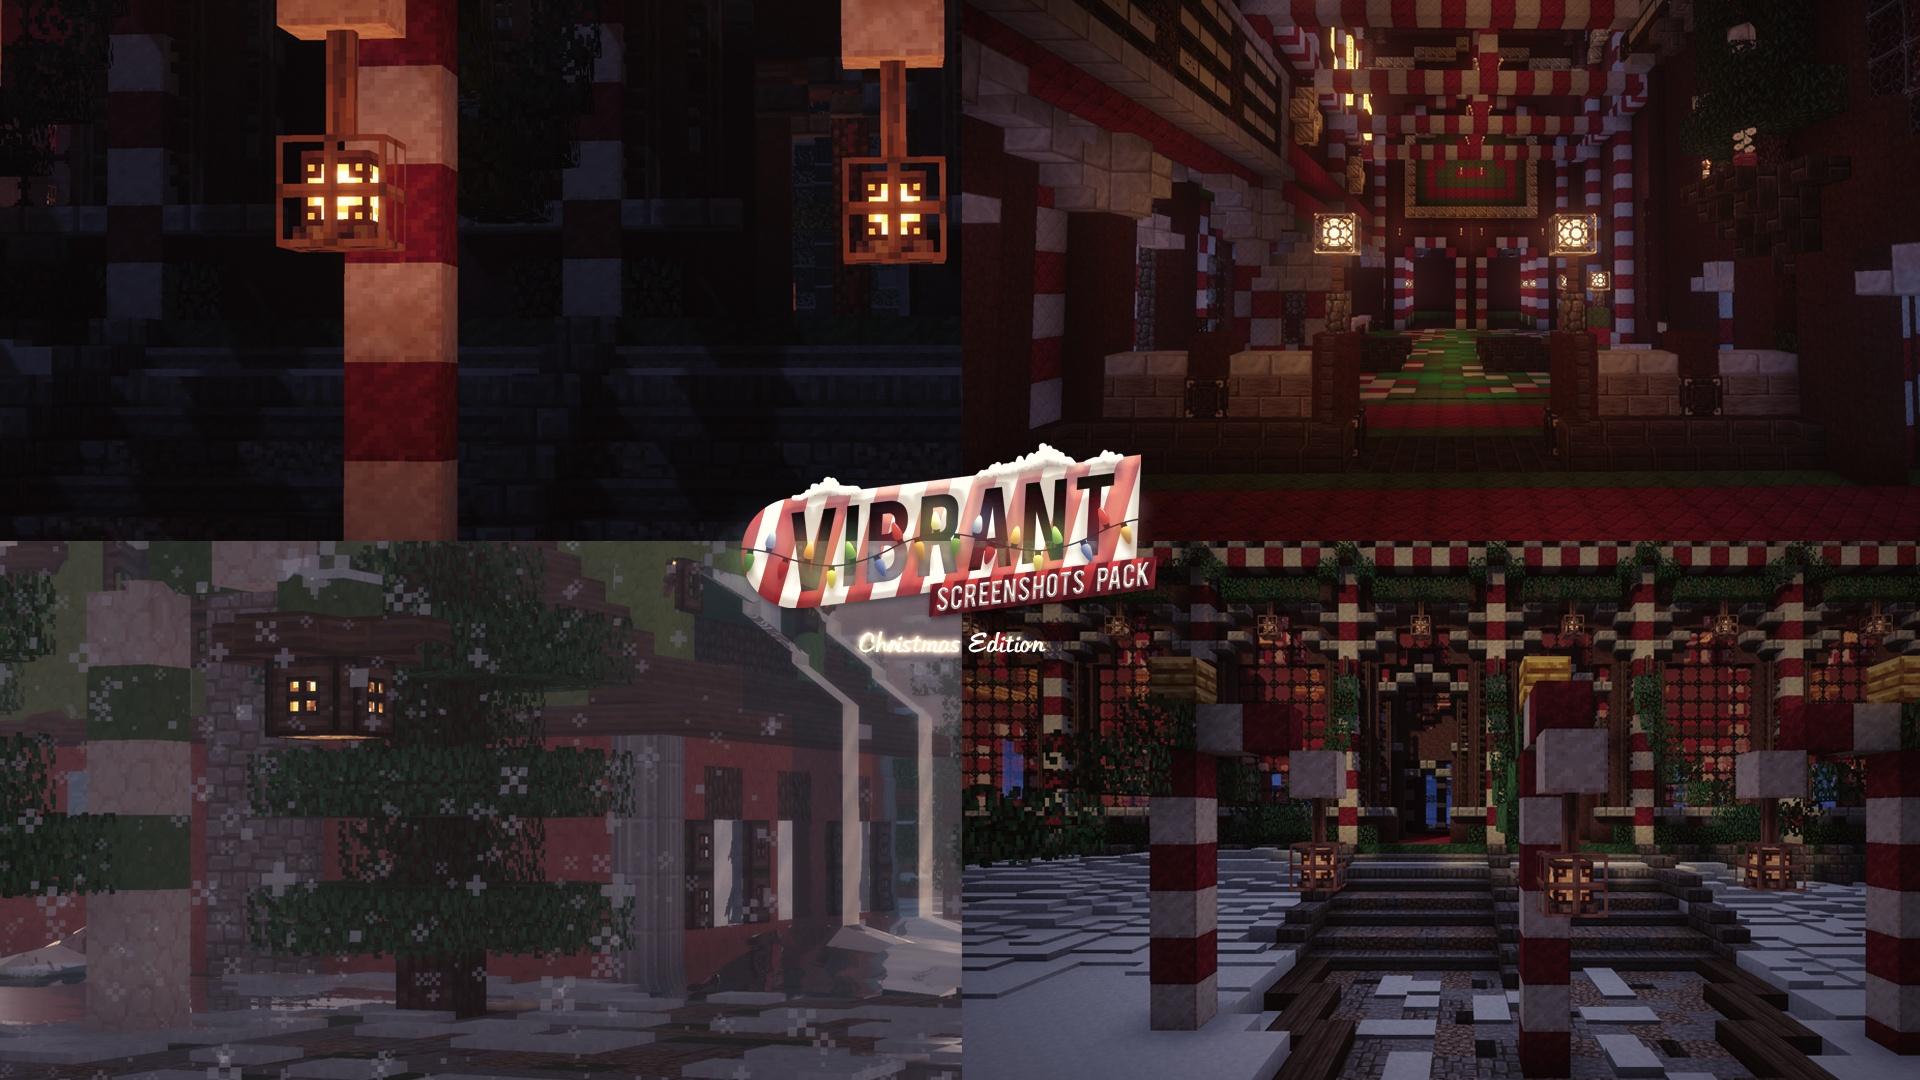 VIBRANT Screenshots Pack CHRISTMAS EDITION [100 screenshots]